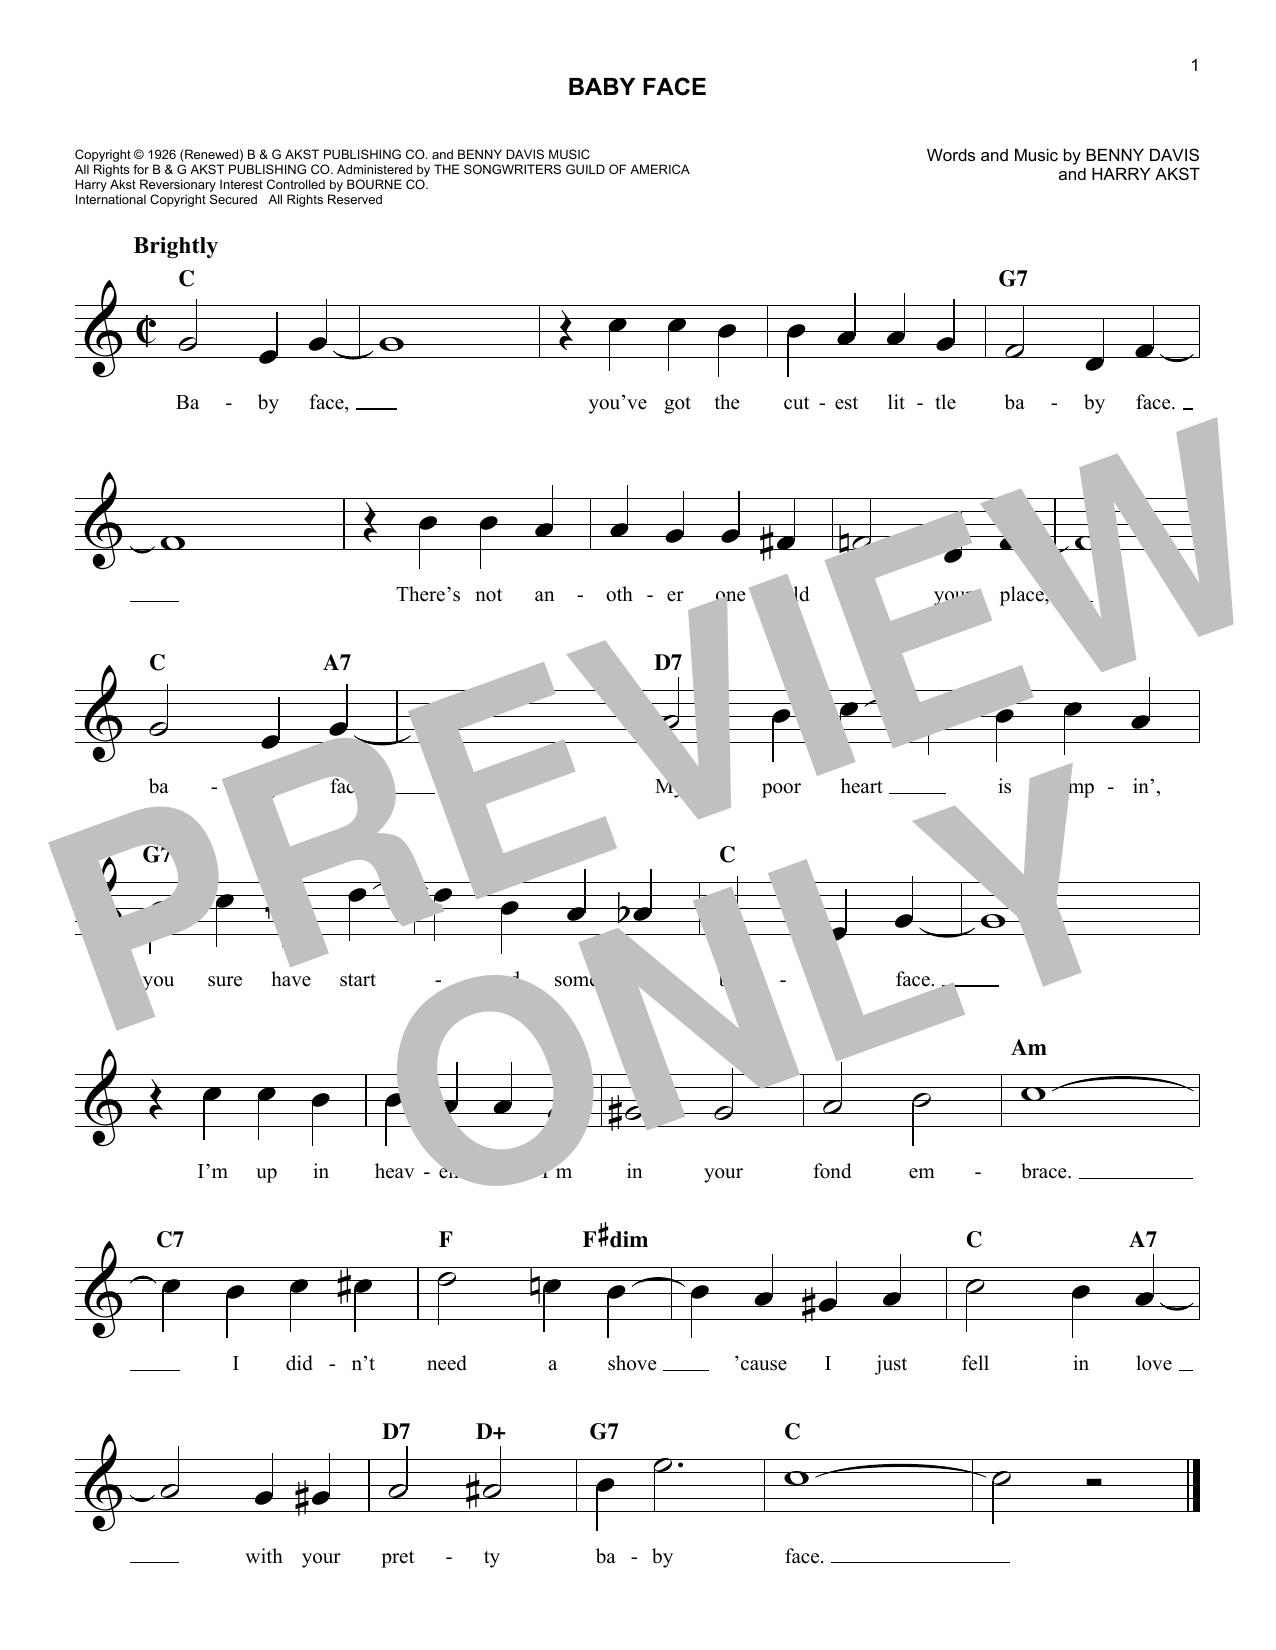 Bobby Darin Baby Face sheet music notes and chords. Download Printable PDF.